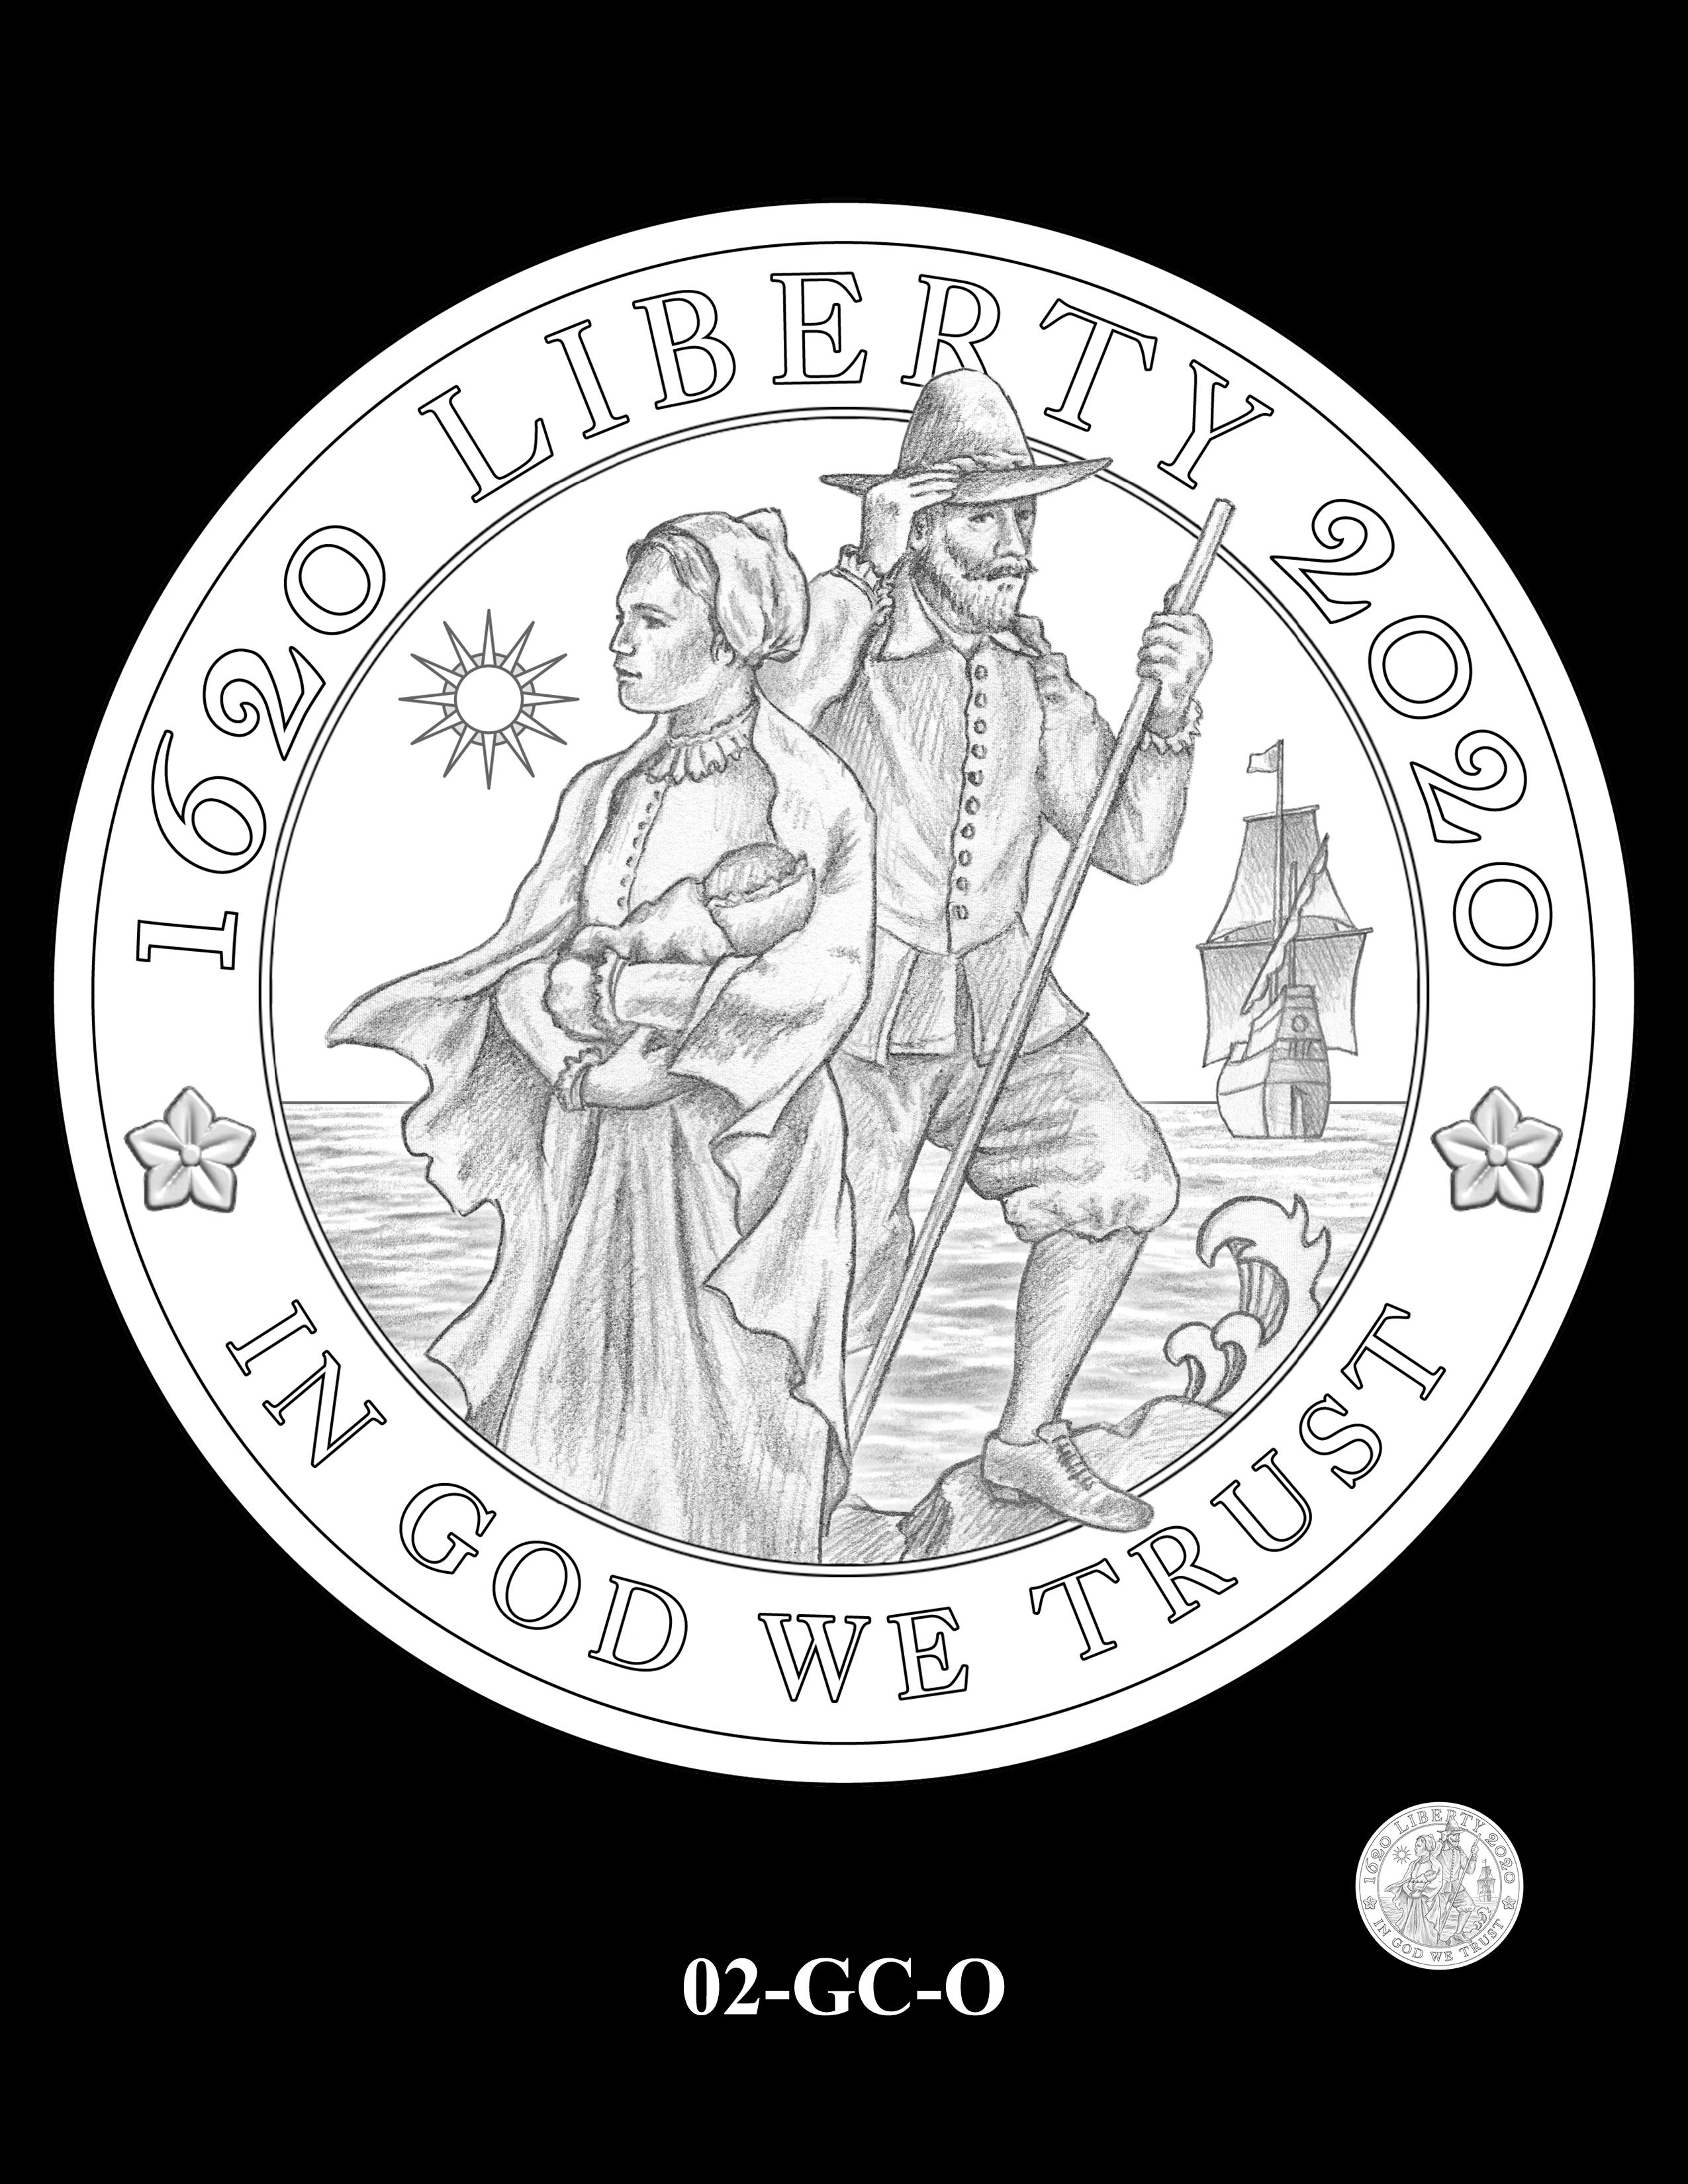 02-GC-O - 2020 Mayflower 400th Anniversary 24K Gold Coin & Silver Medal Program